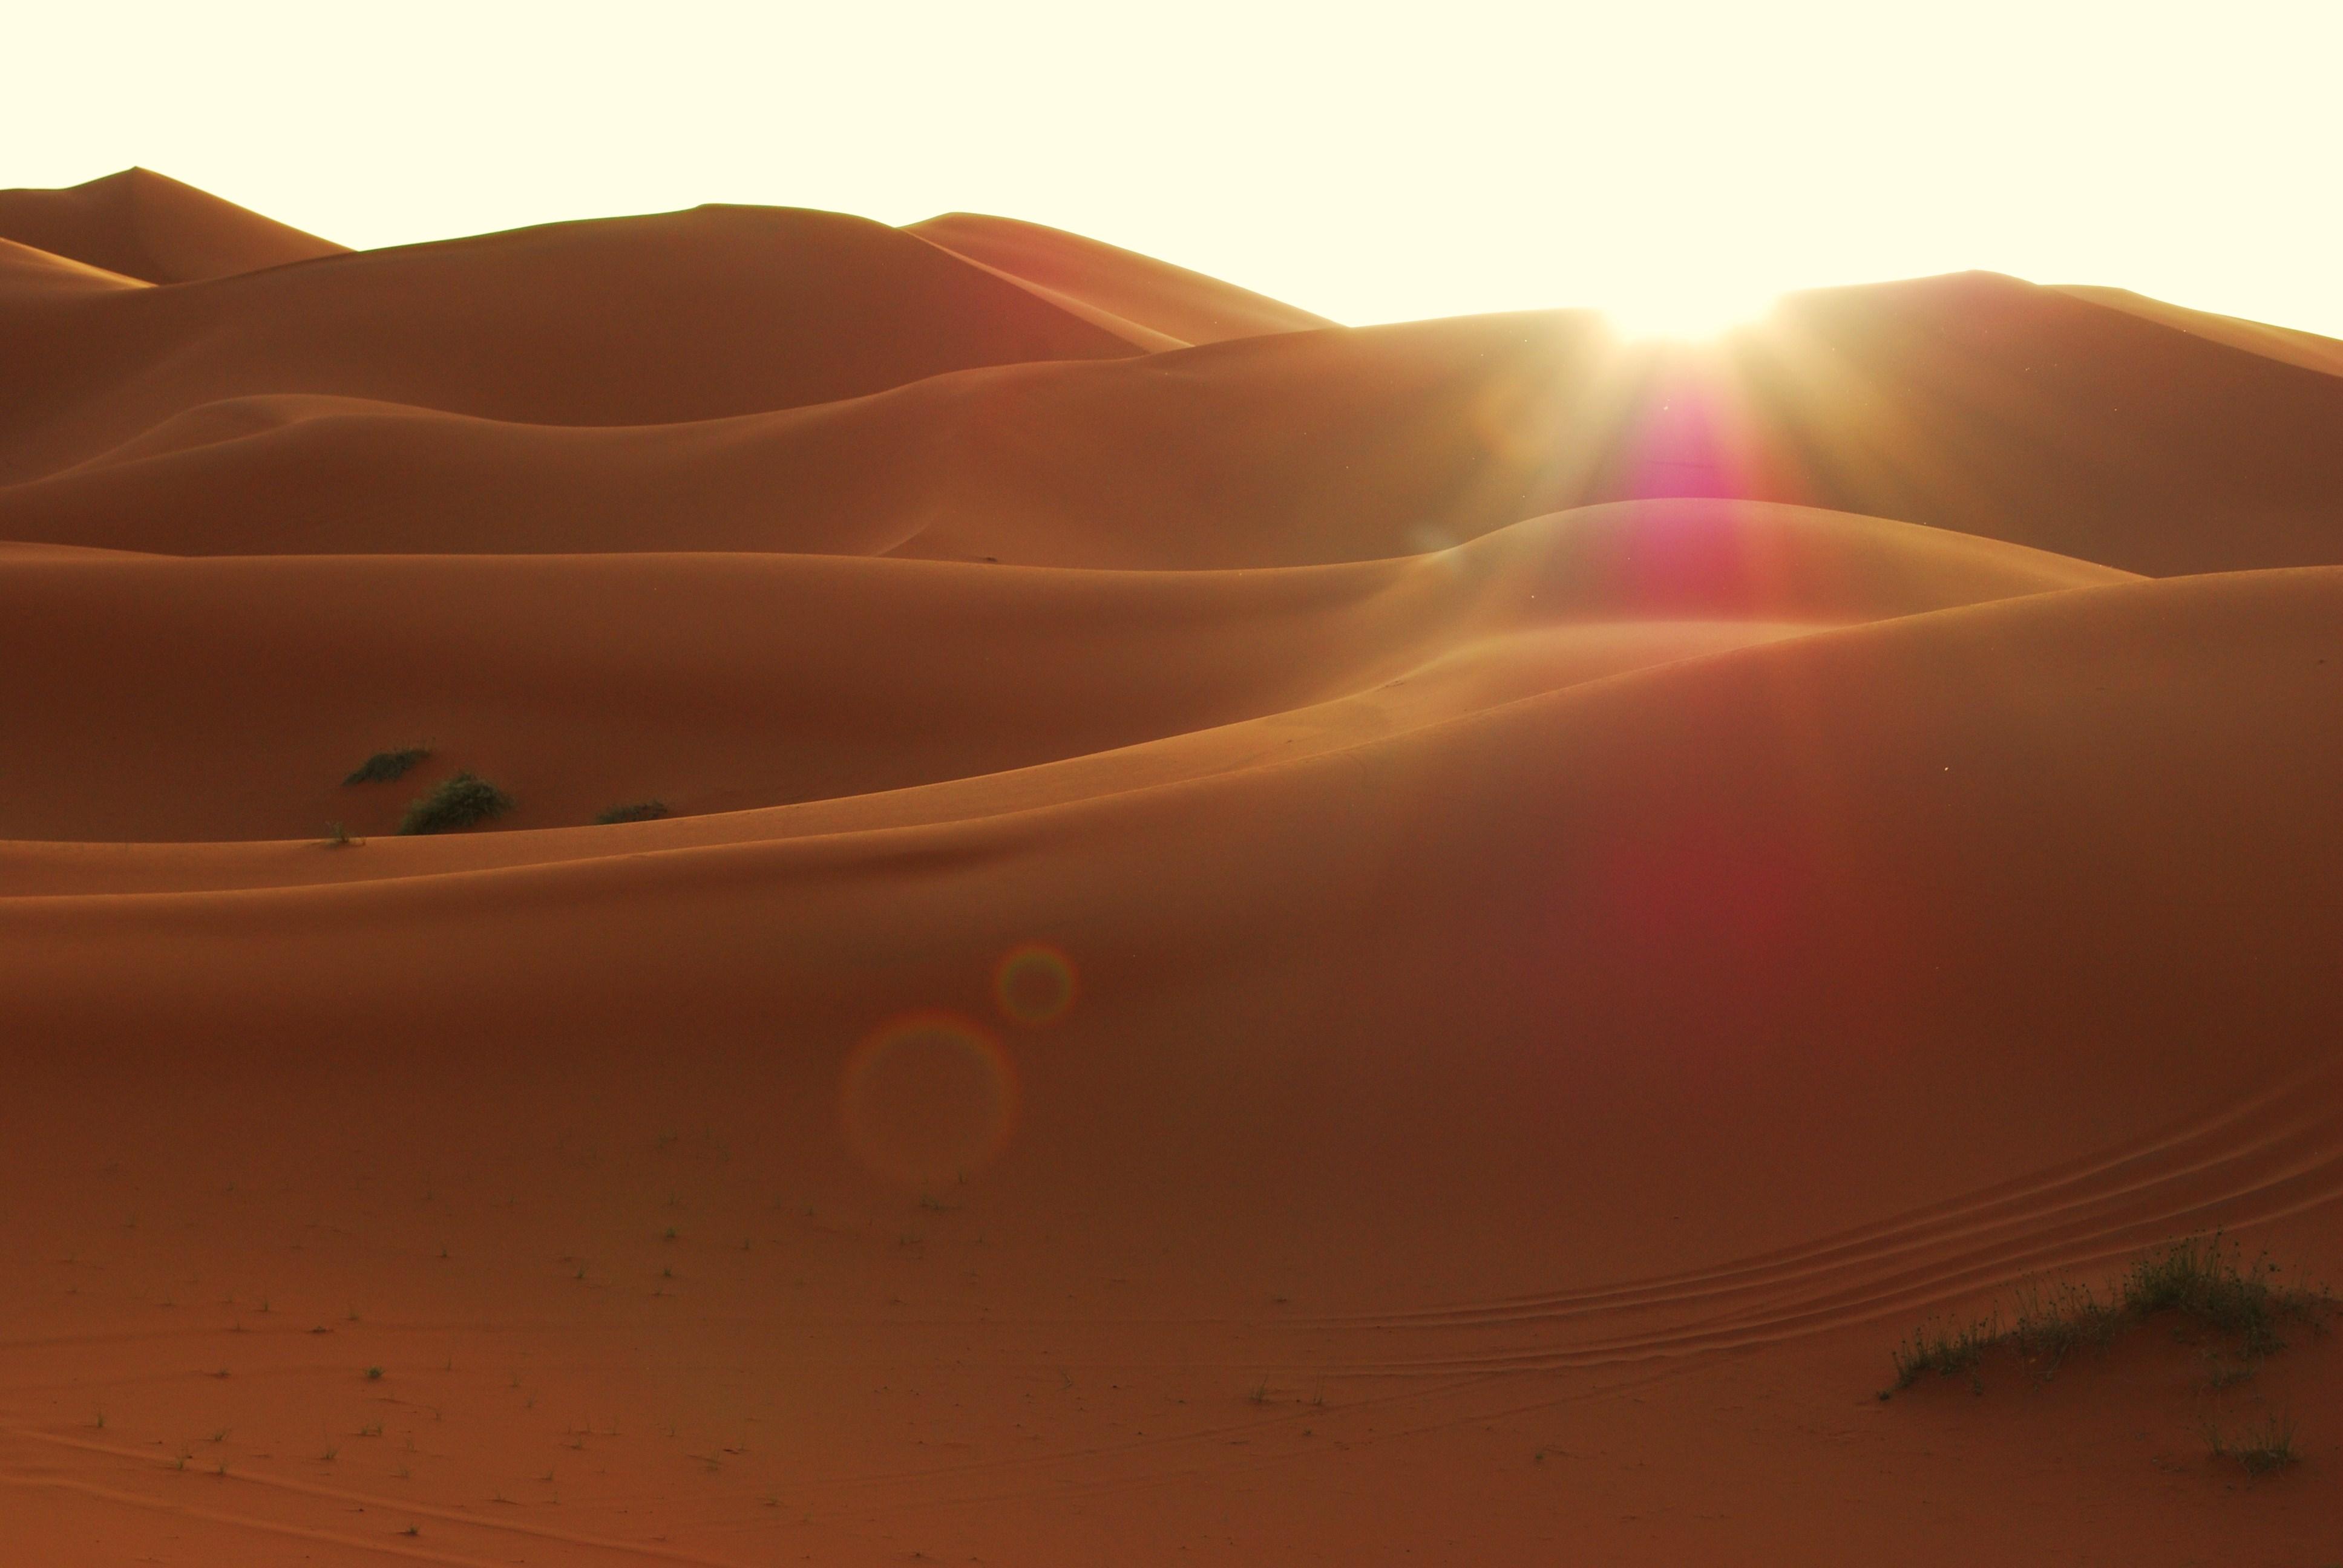 Dunes-Leve_soleil-Sunrise-Merzouga.JPG